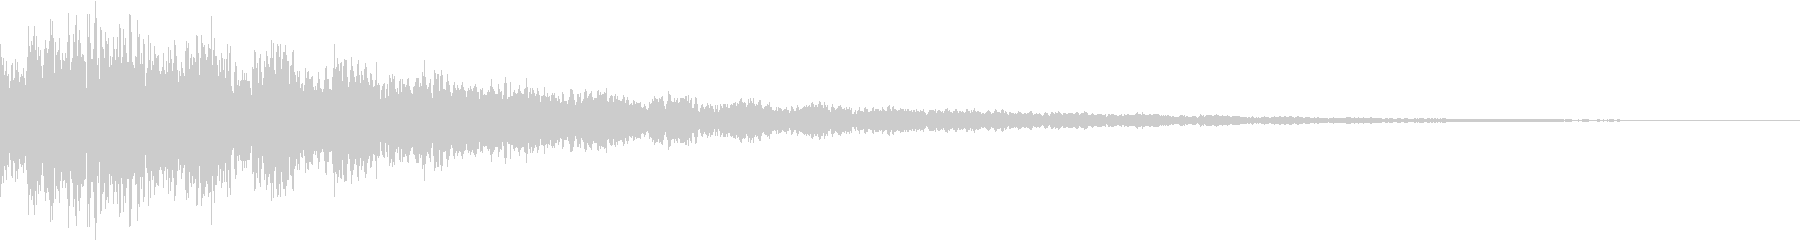 AnimeFX ゲゲゲな雰囲気の妖怪SEの未再生の波形